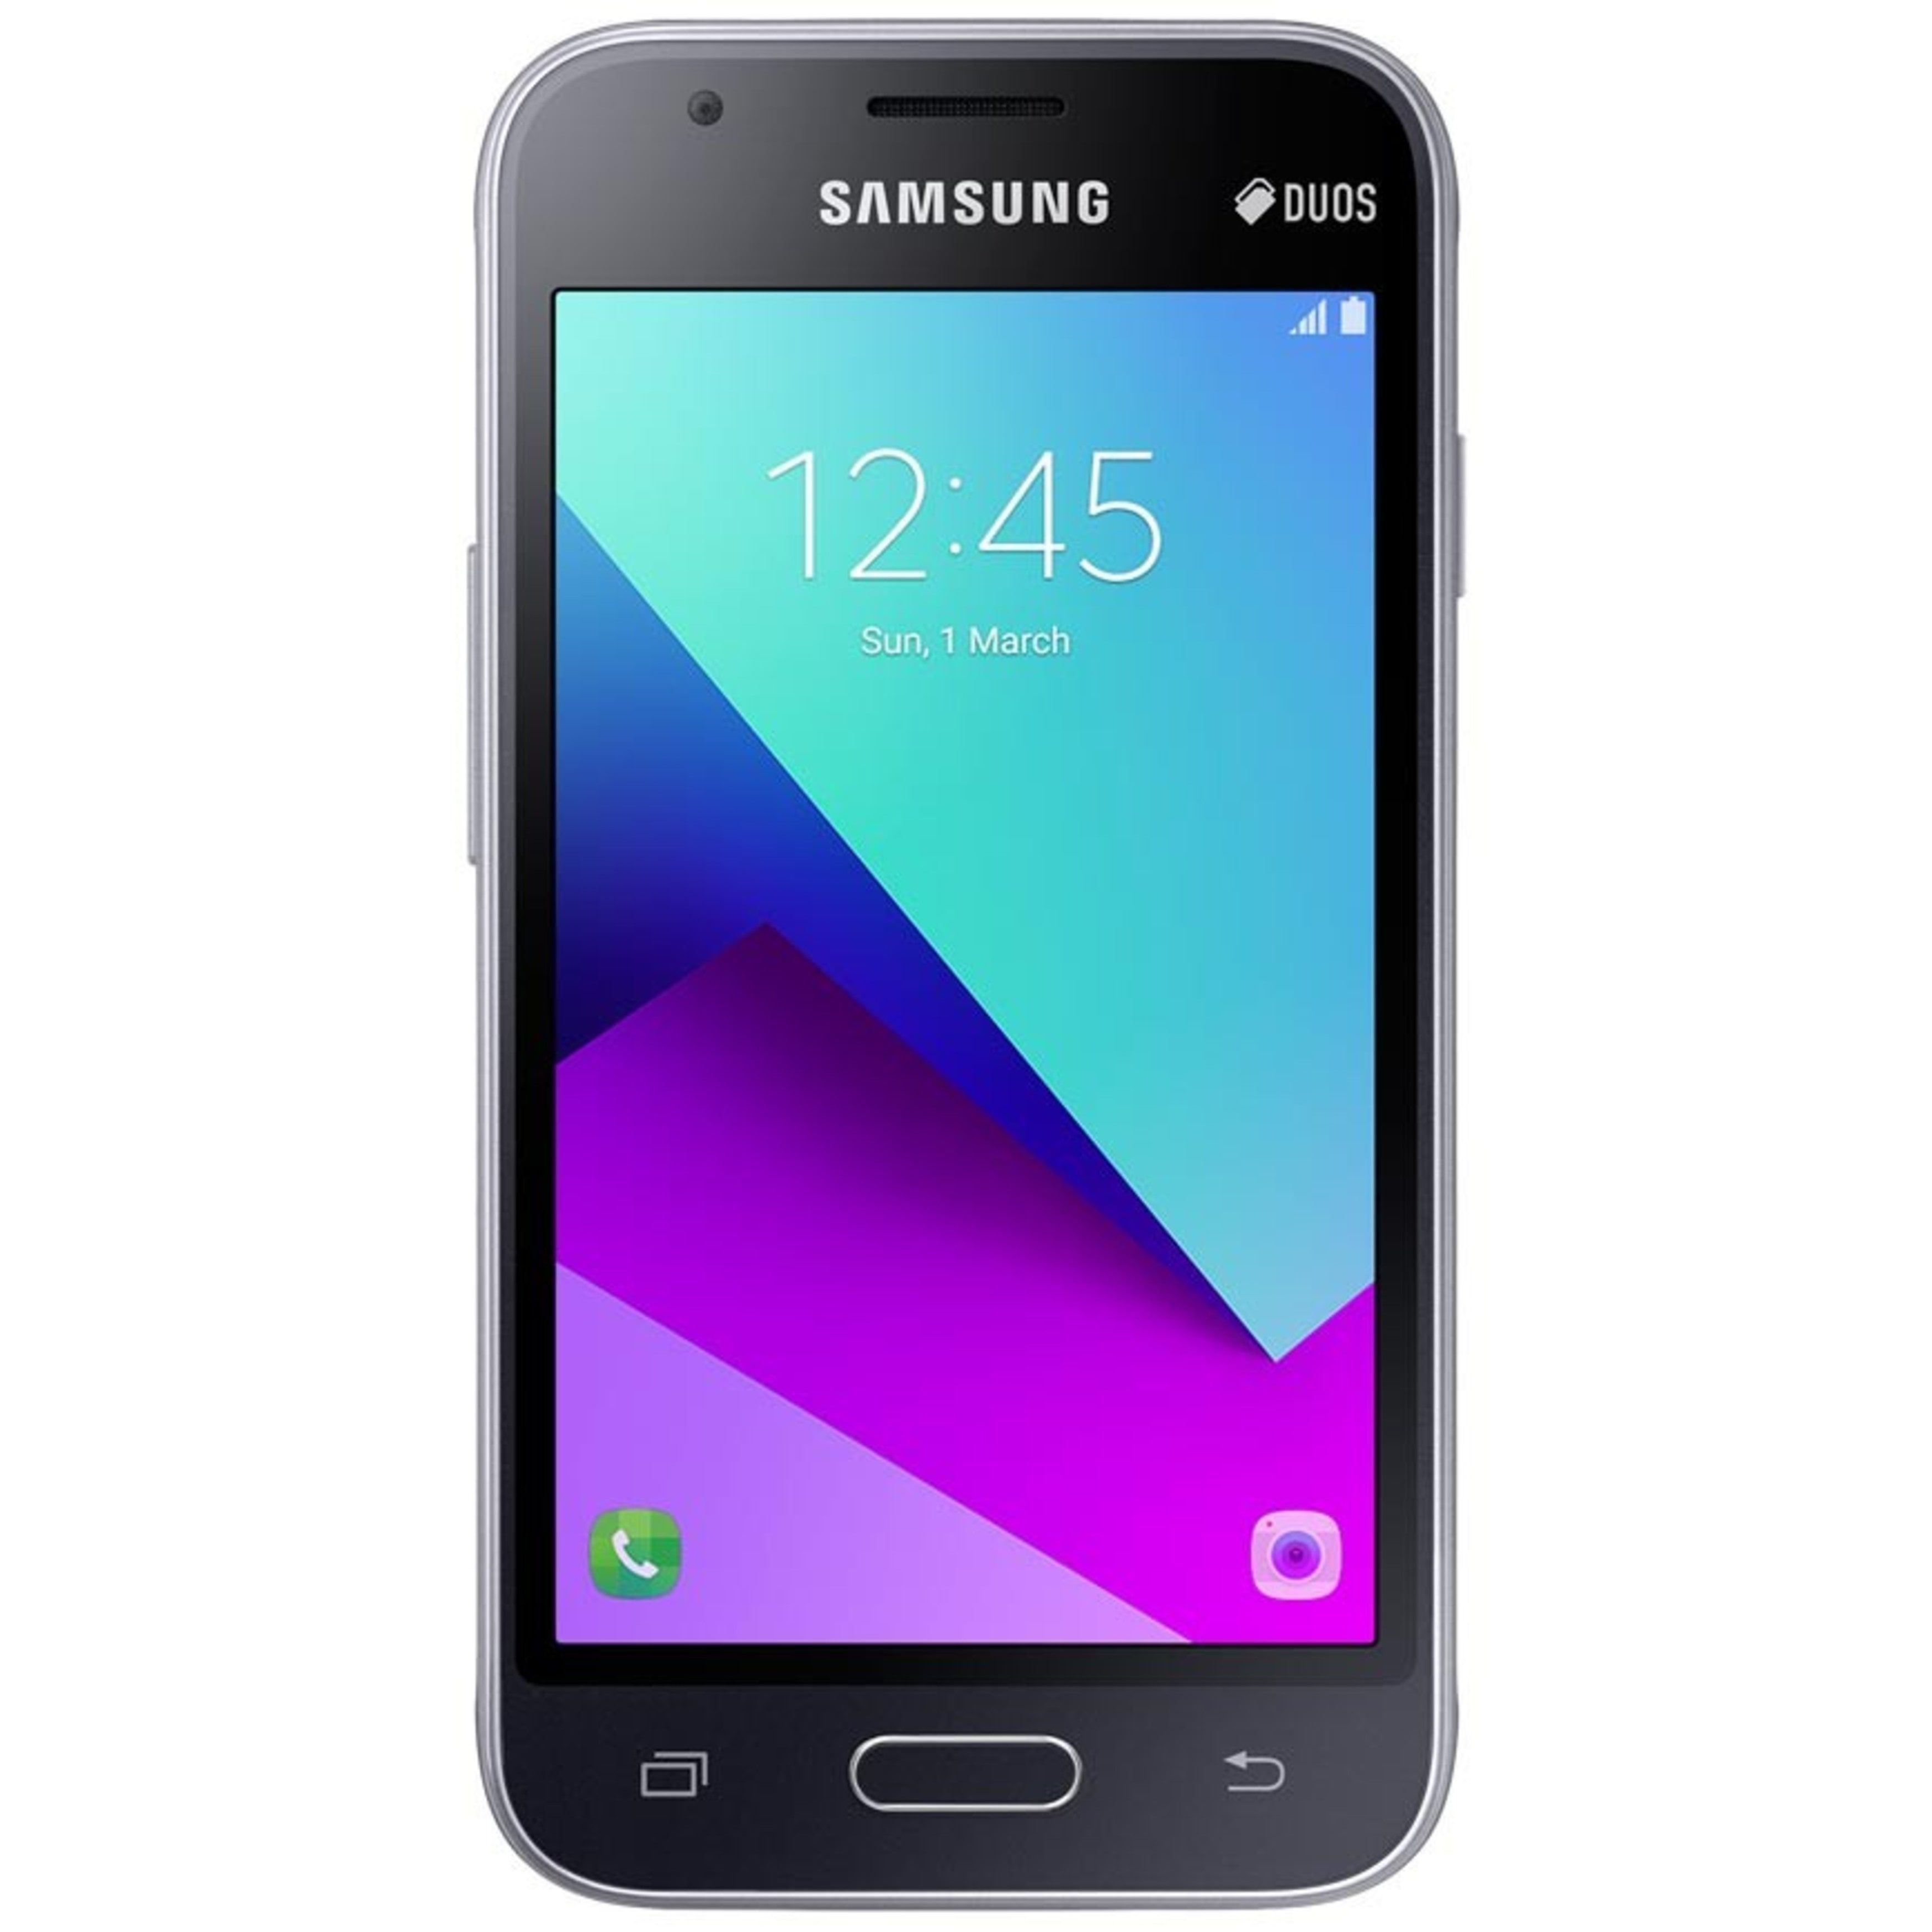 Samsung Refurbished Samung Galaxy J1 Mini Prime Duos J106b 3g Phone New Iphone Se 64gb Garansi International Gold Silverwhite